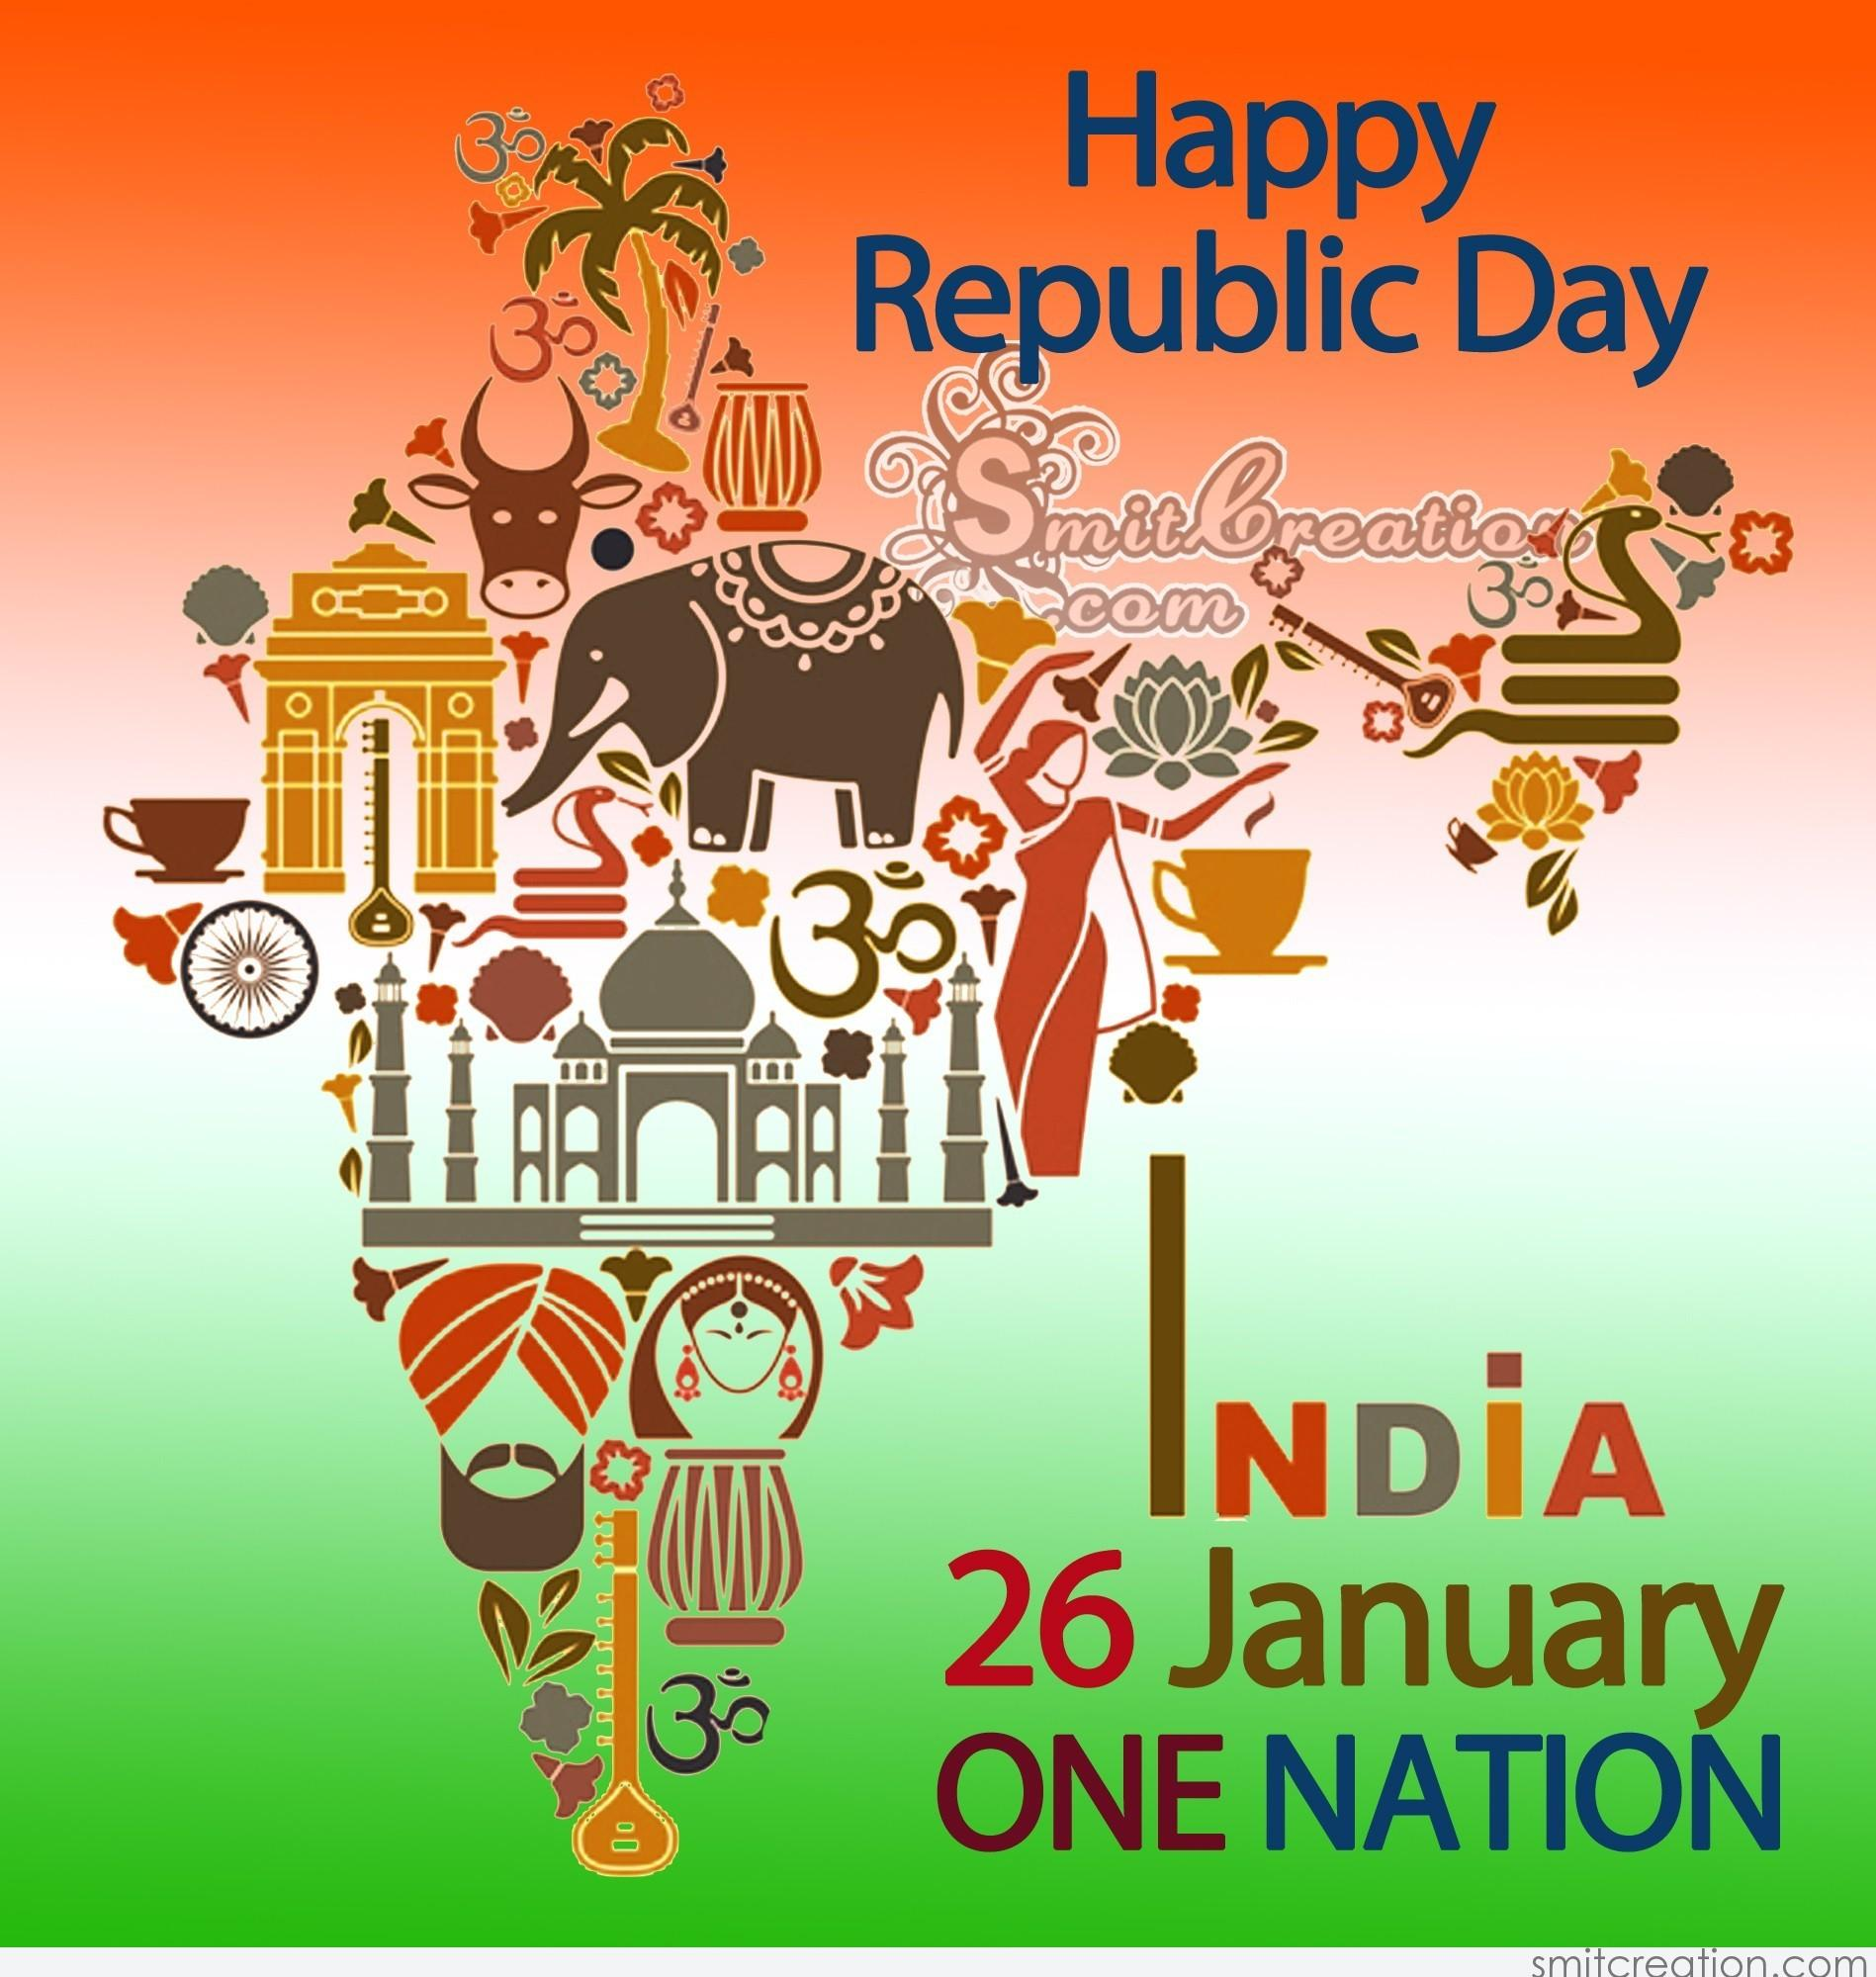 Happy republic day india 26 january one nation smitcreation download image m4hsunfo